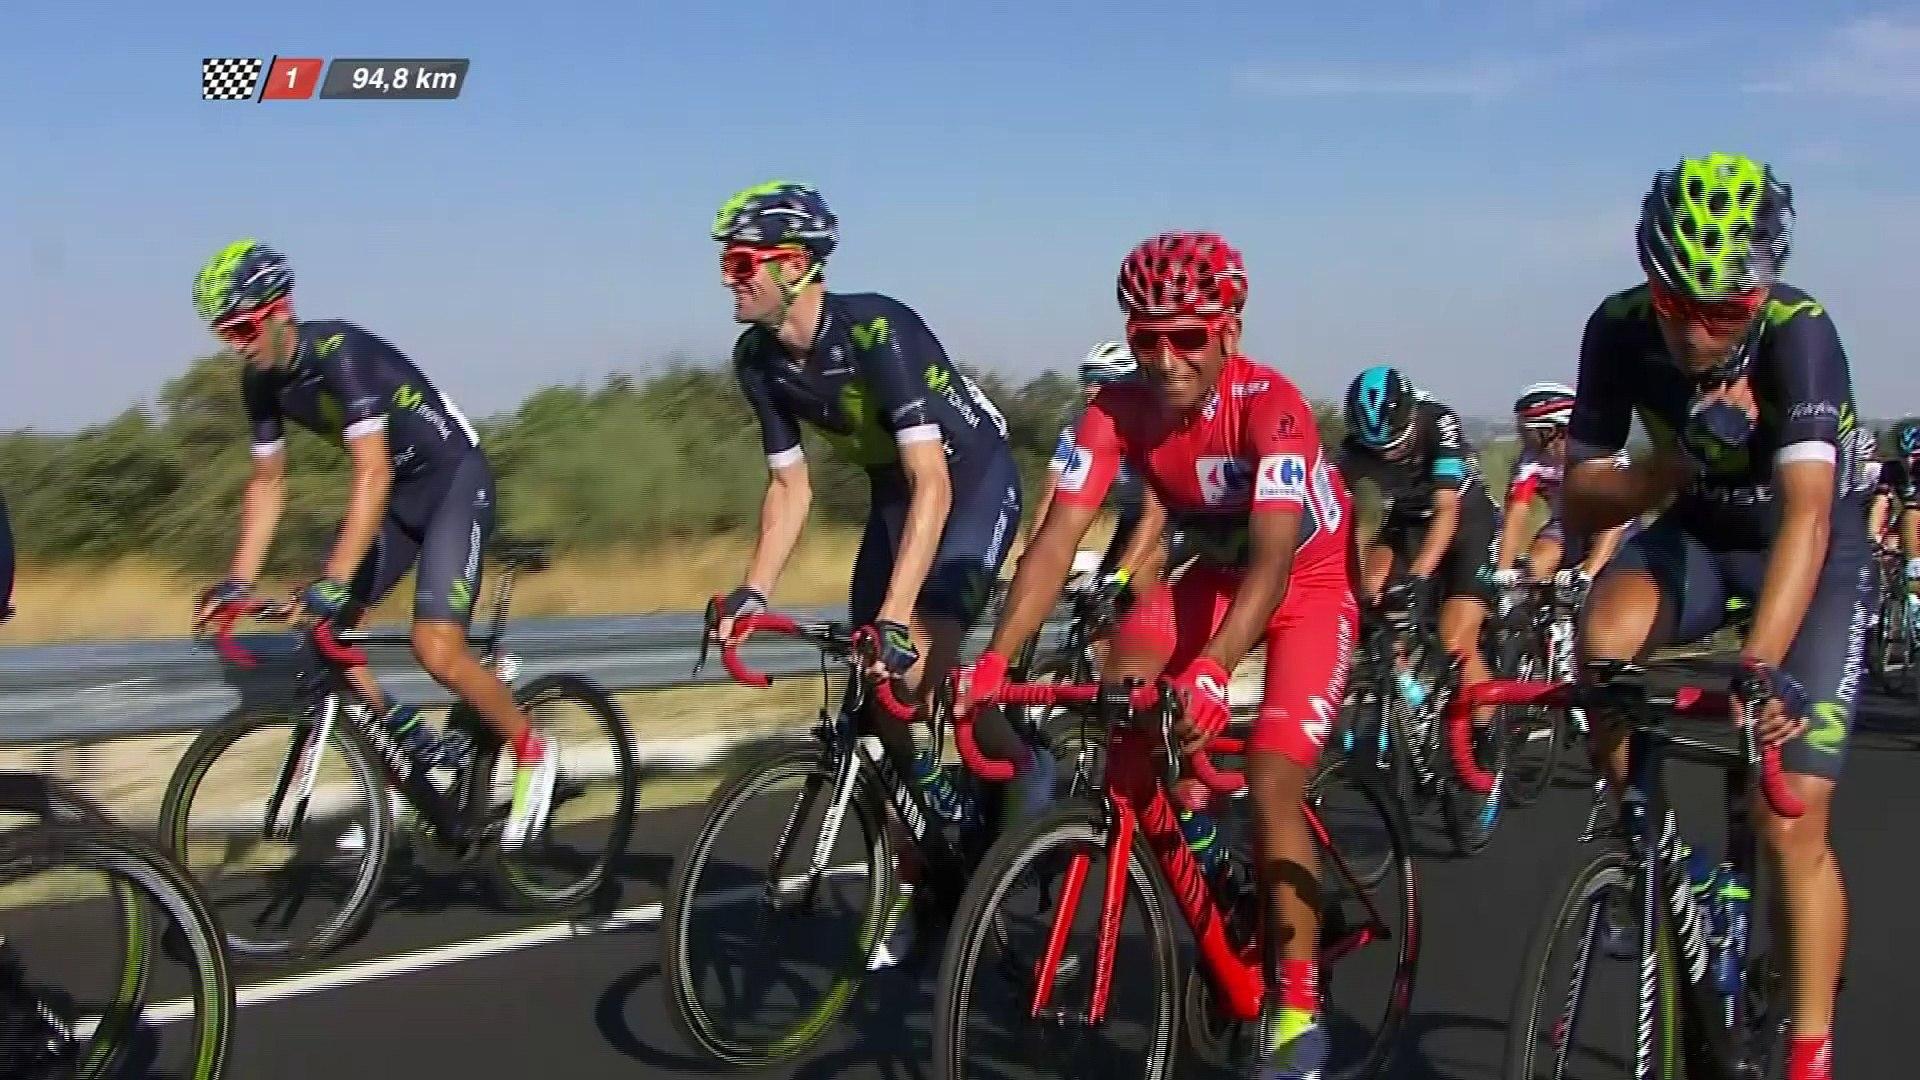 Nairo celebra su victoria / Quintana is smiling in front of the pack - Etapa / Stage 21 (Las Rozas /